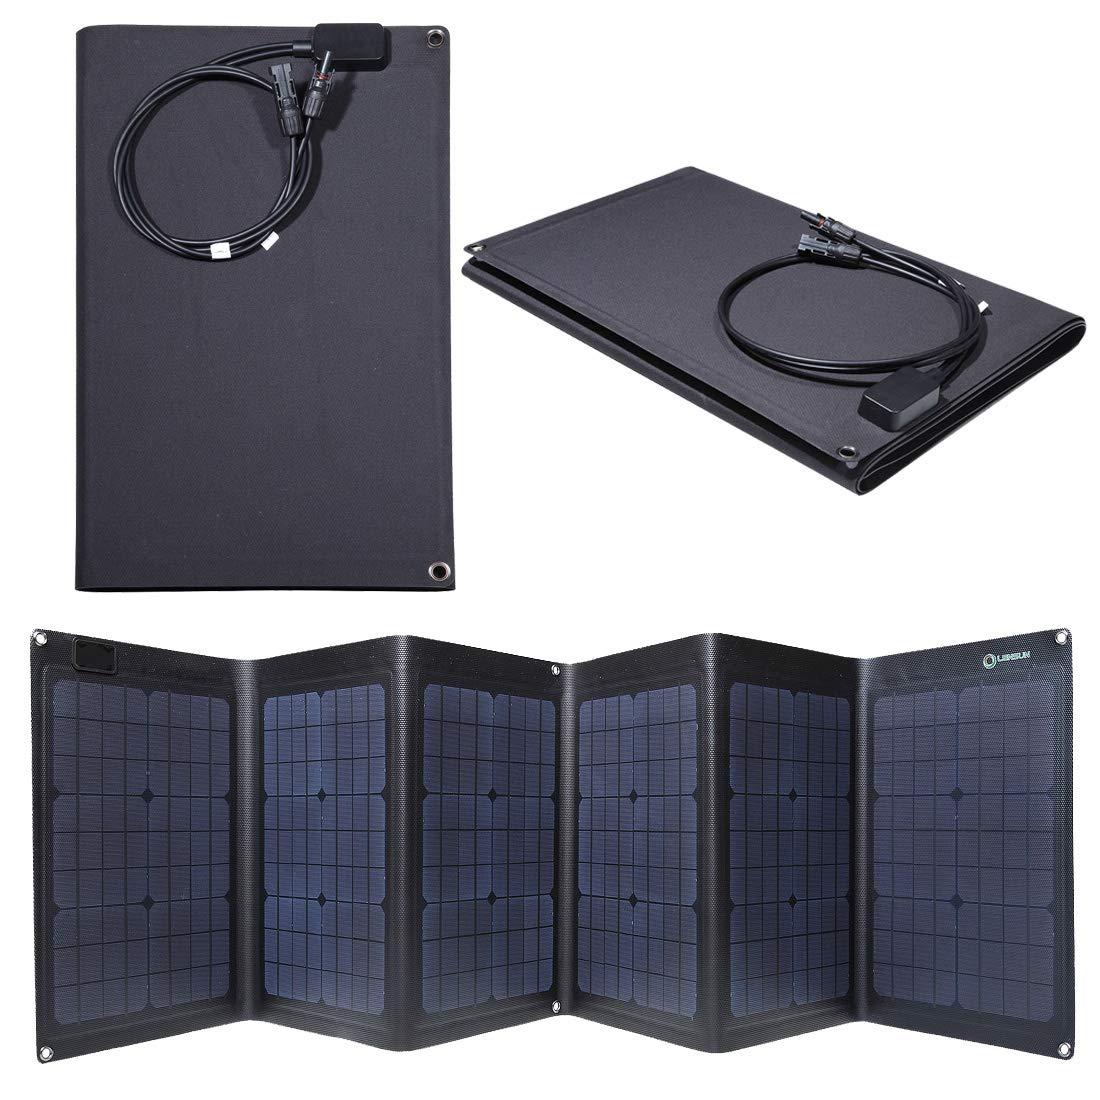 Lensun ETFE Coating 100W 18V Black Portable Folding Solar Charger Panel for 12V Batteries, Completely Waterproof, Best and Thinnest Foldable Solar Panel by Lensun